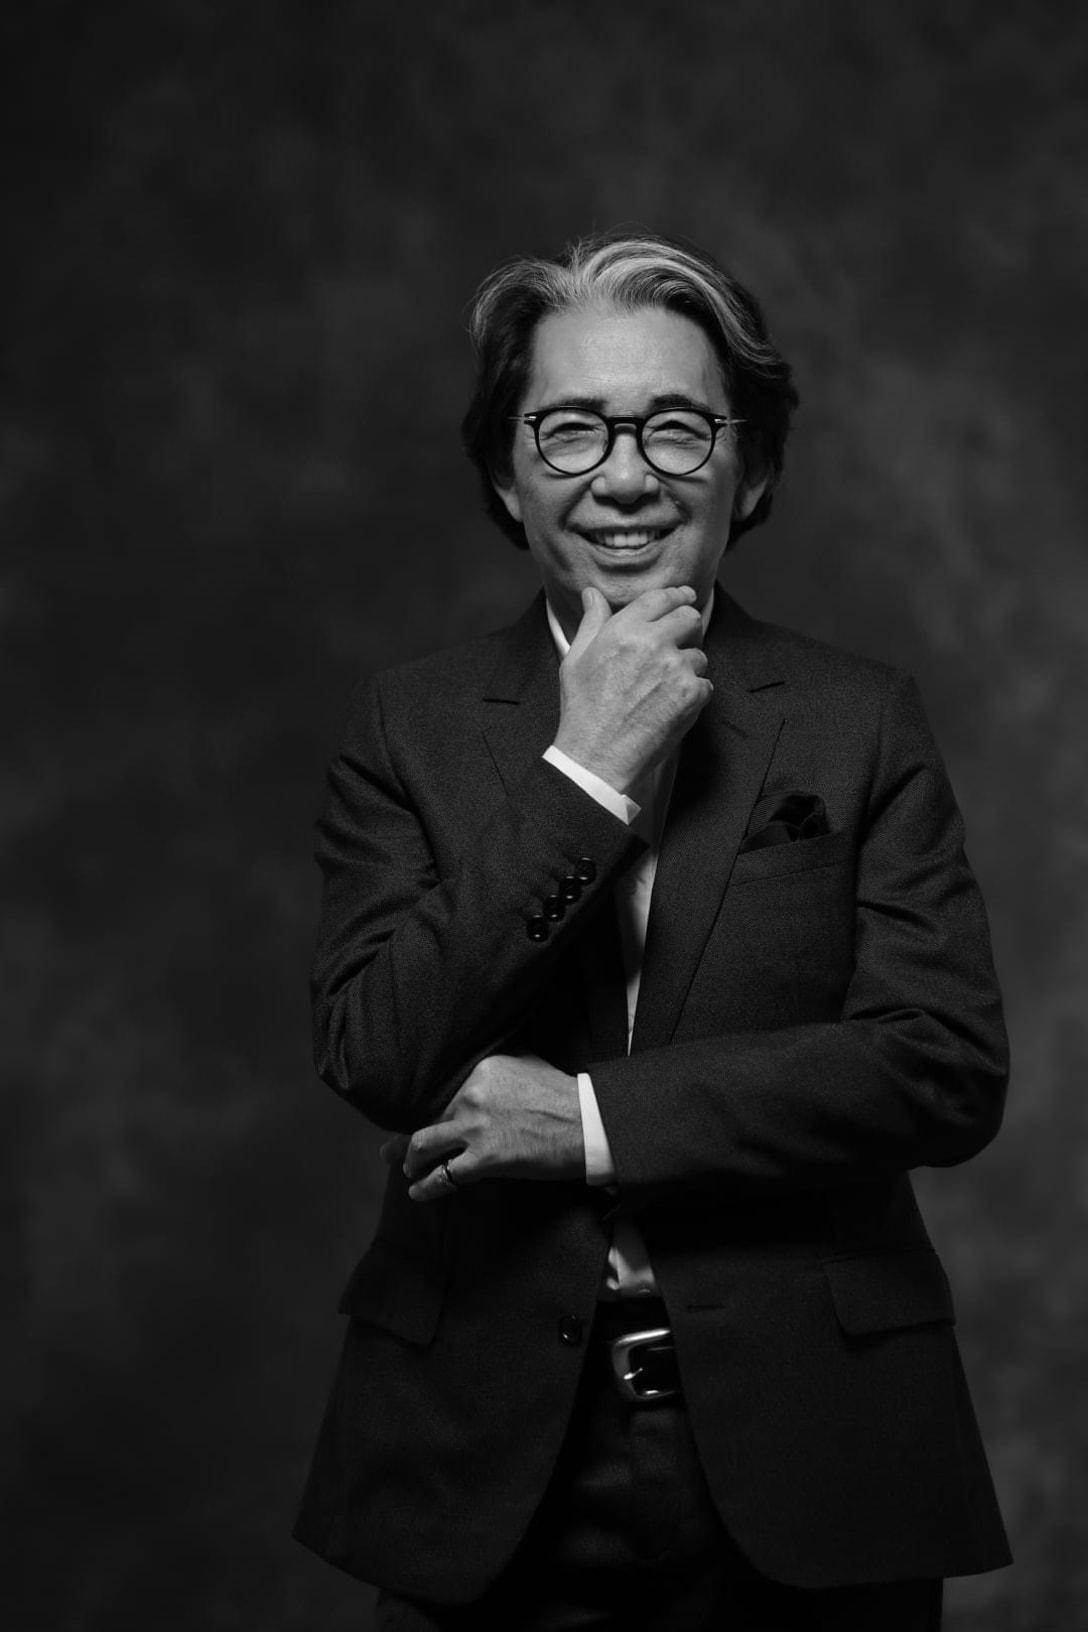 高田賢三、2020年10月4日に永眠 ©️MASARU MIZUSHIMA